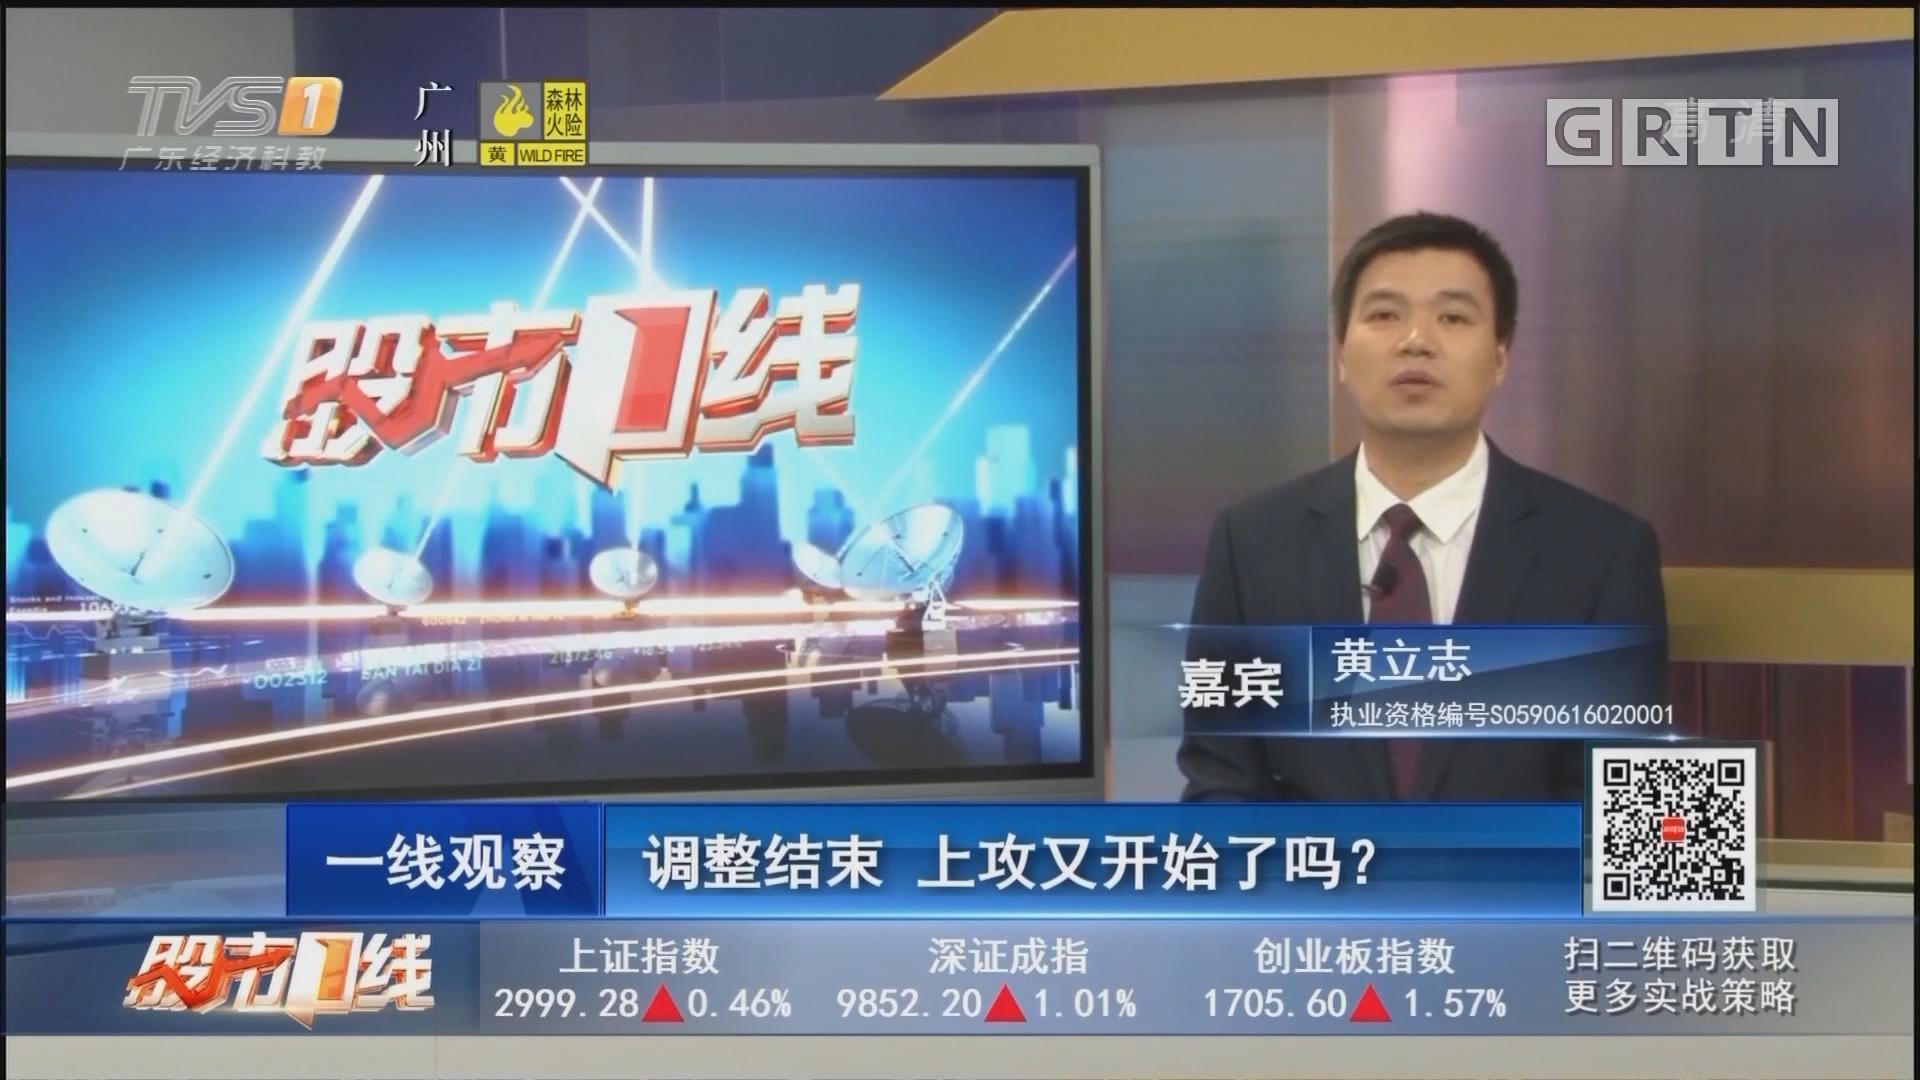 [HD][2019-09-19]股市一线:调整结束 上攻又开始了吗?